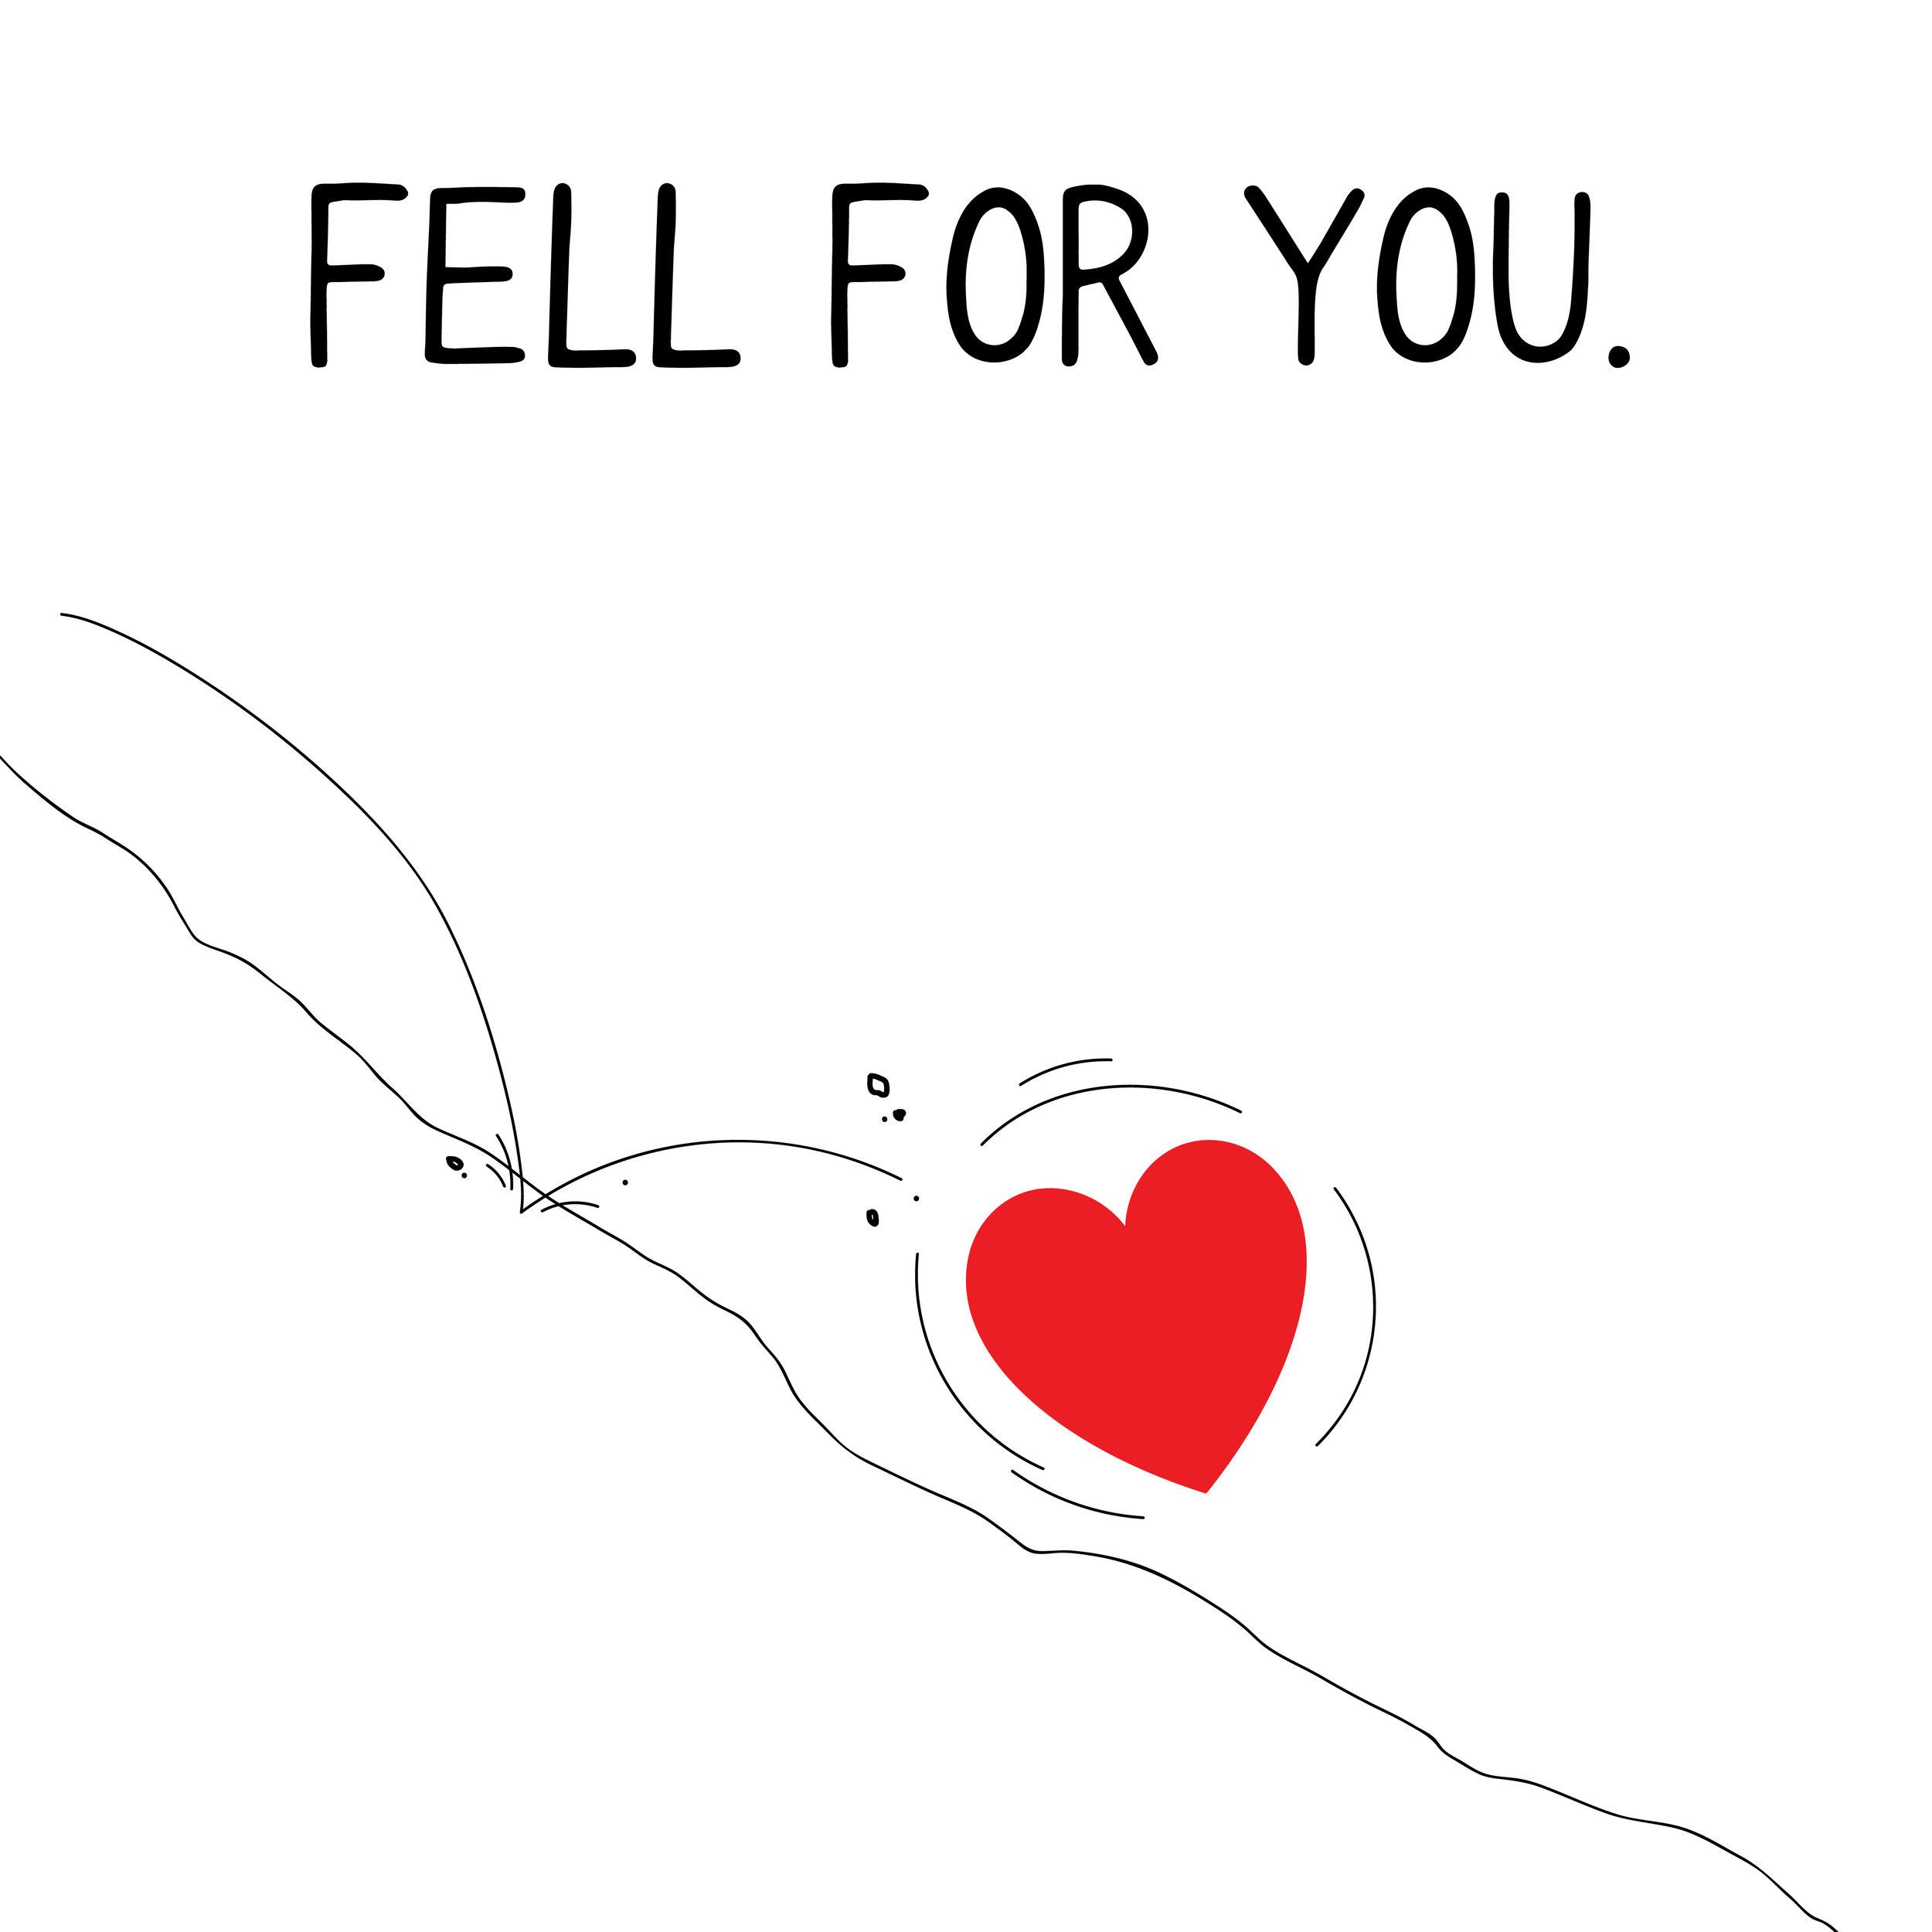 fellforyou-01.jpg